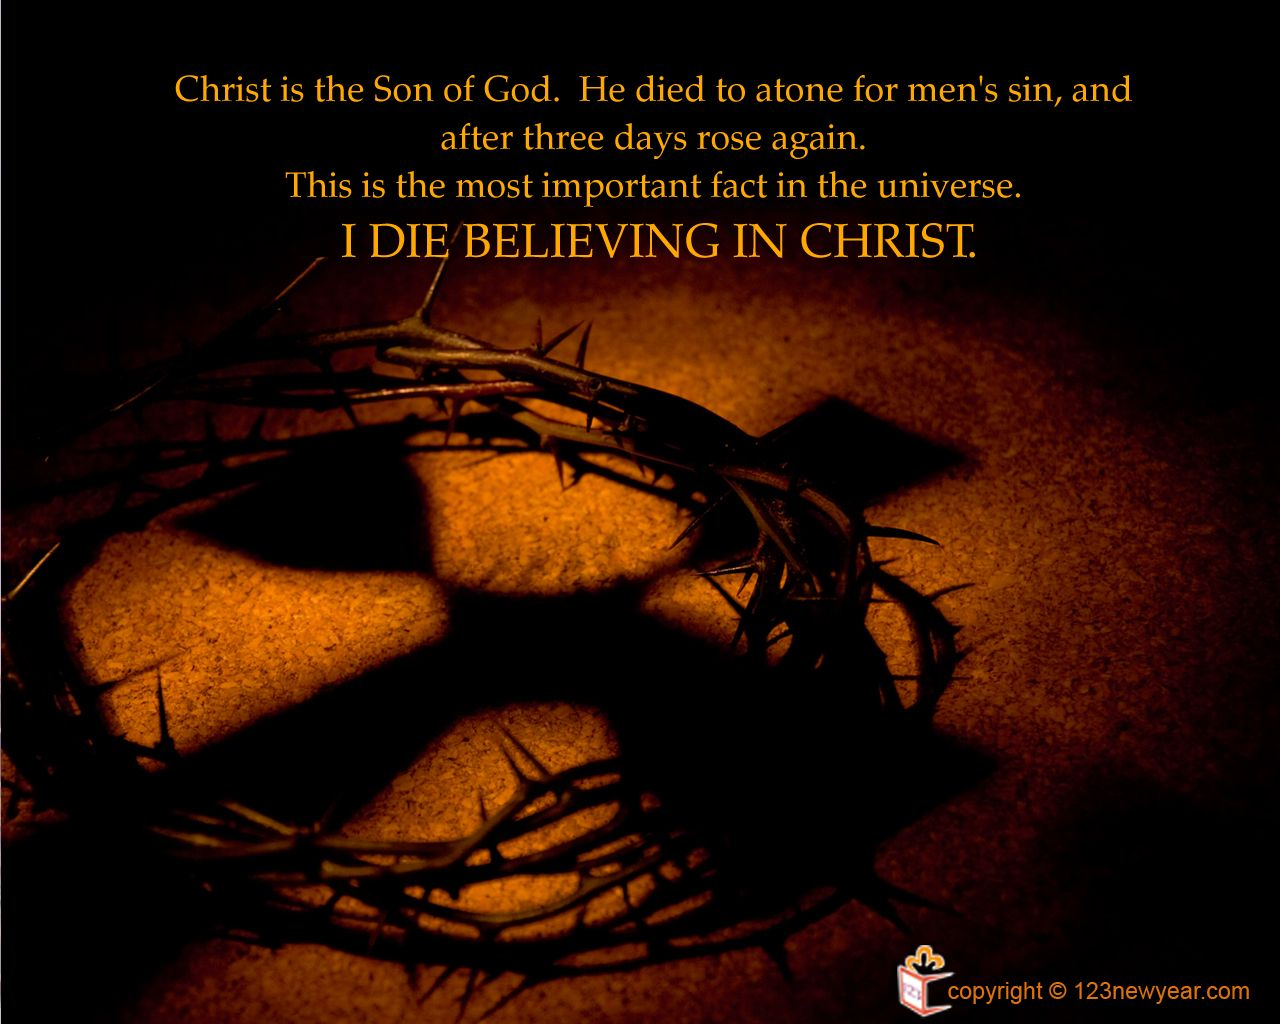 Easter Bible Verses: 10 Christian Favorite Scriptures About Resurrection of Jesus